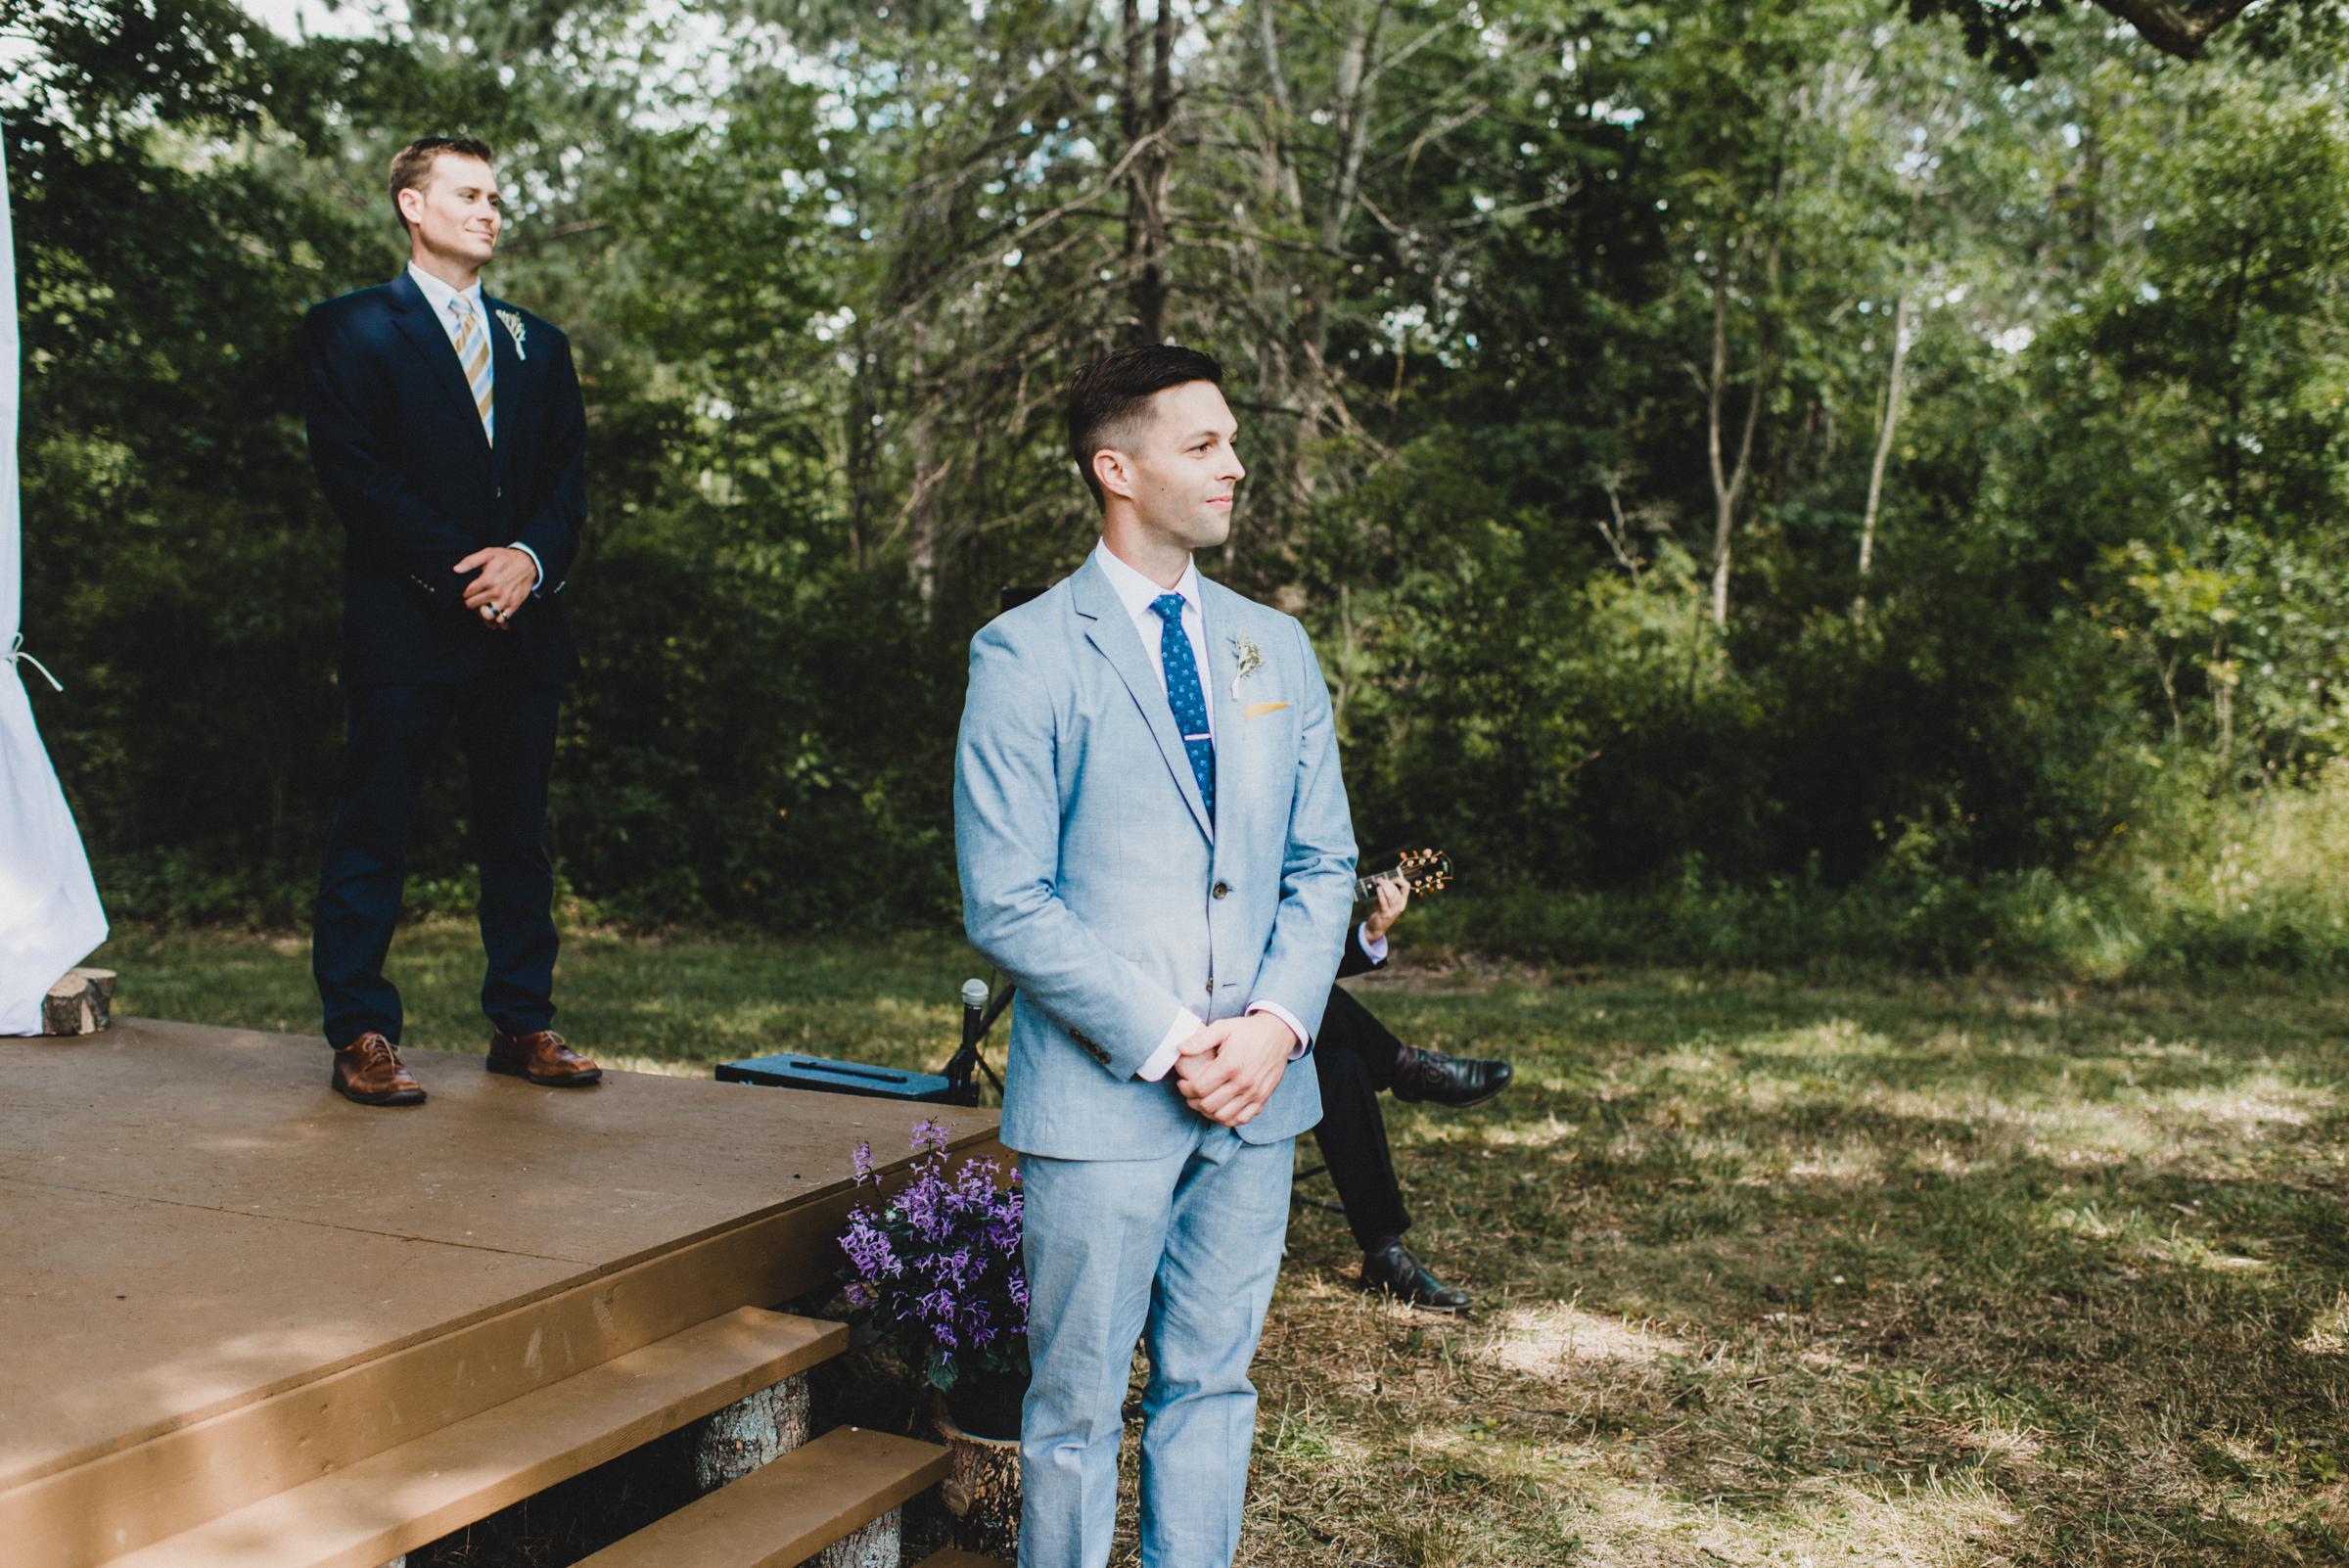 Intimate-Backyard-Farmhouse-Ohio-Wedding-Andi+Ben_Mallory+Justin-Photographers-148.JPG